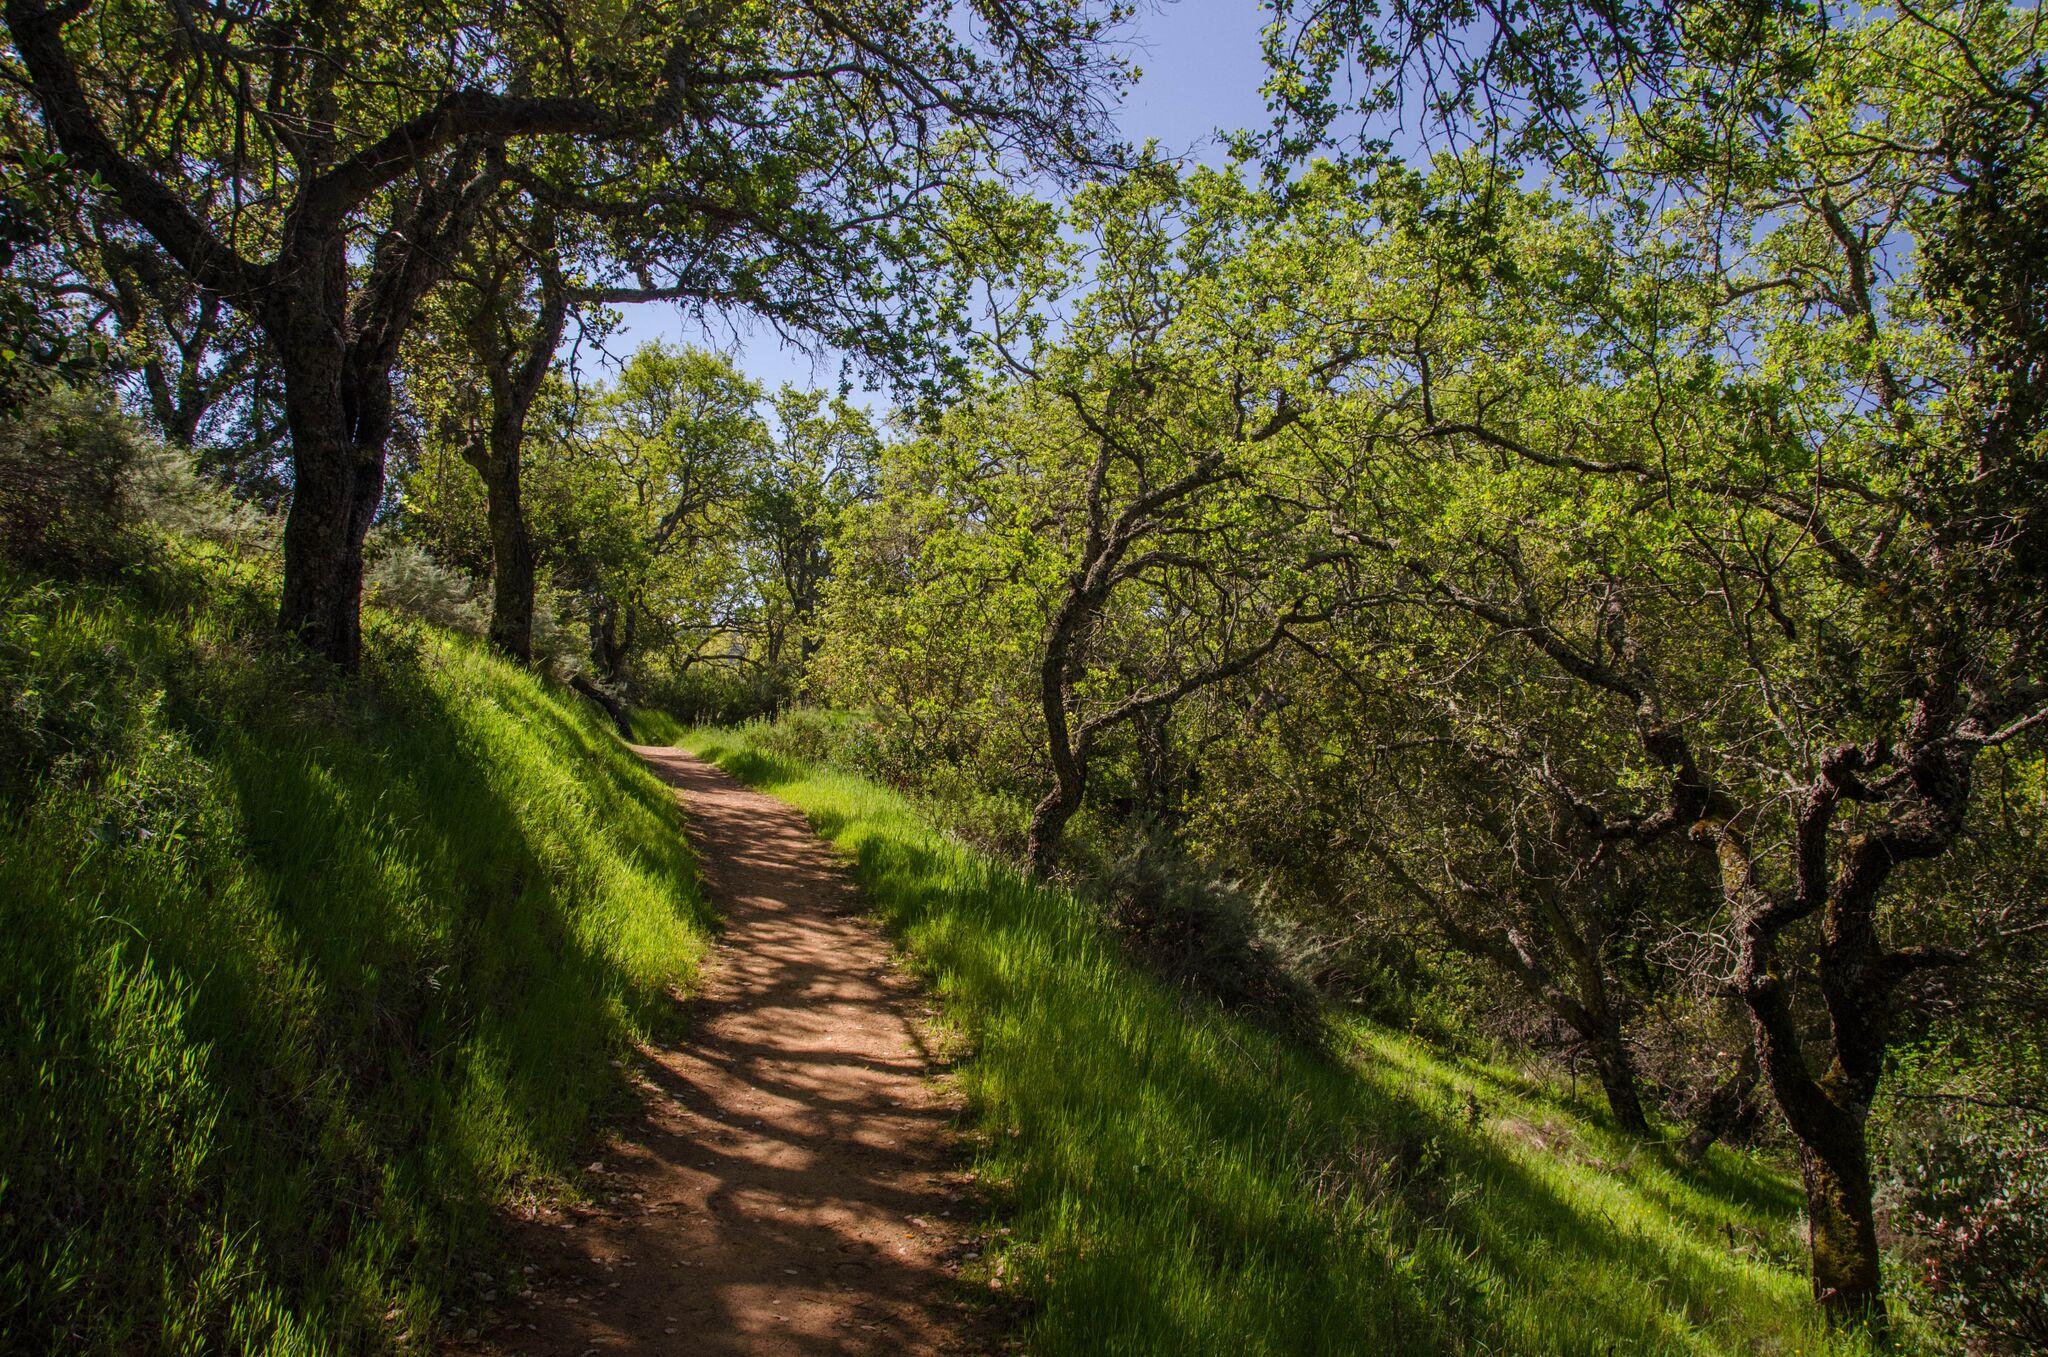 Mayfair-Trail_Rancho-Canada-del-Oro-Open-Space-Preserve_Cassie-Kifer-16_preview